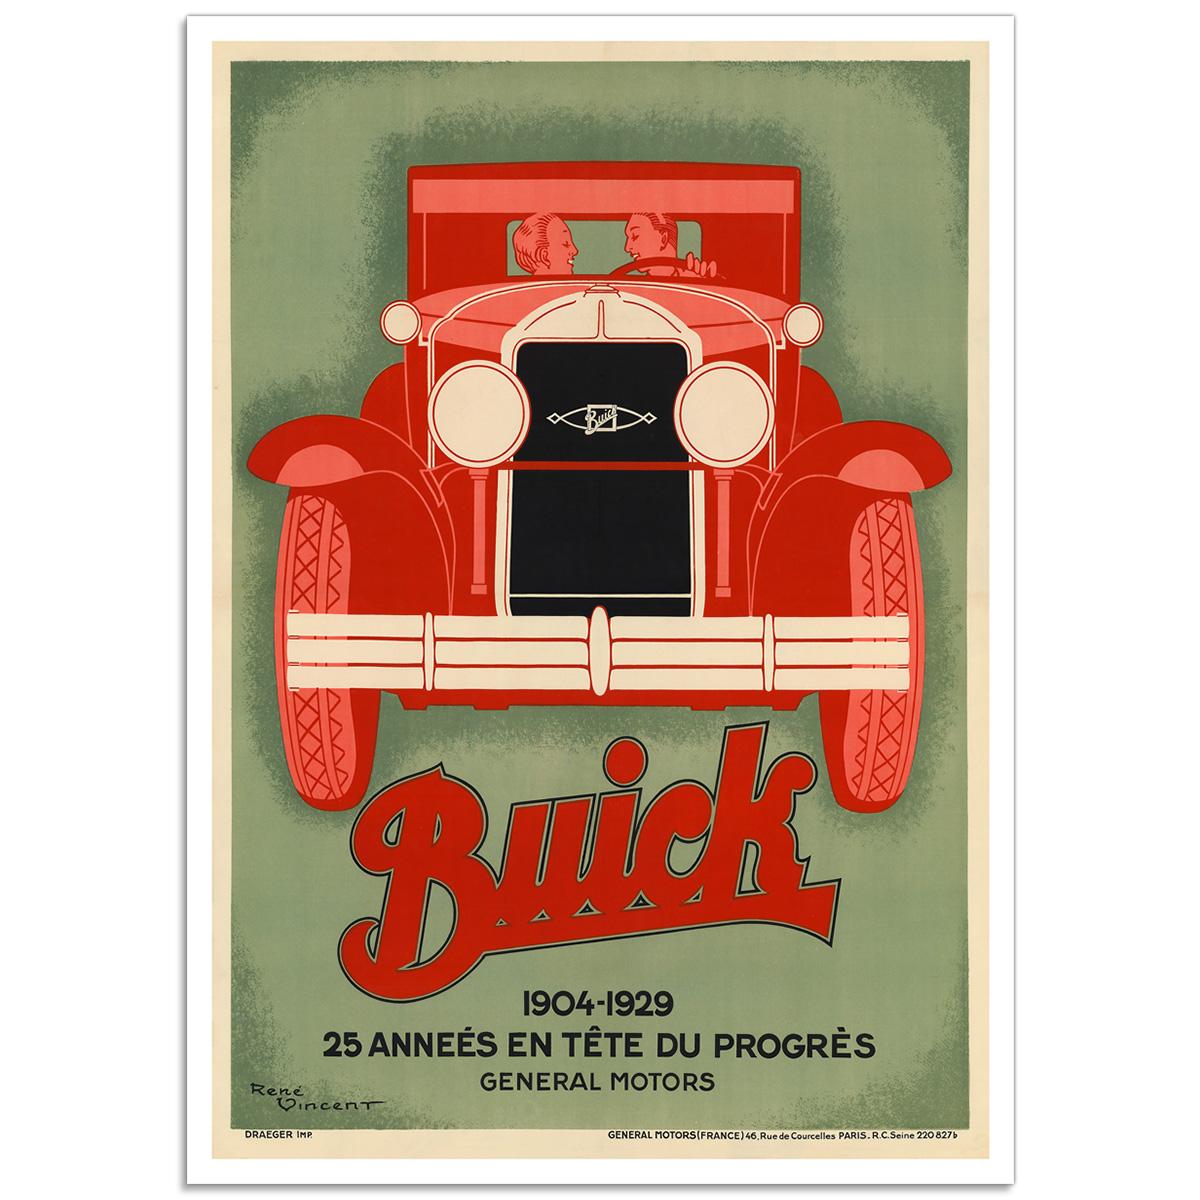 Buick 1904-1929 - Art Deco Auto Poster